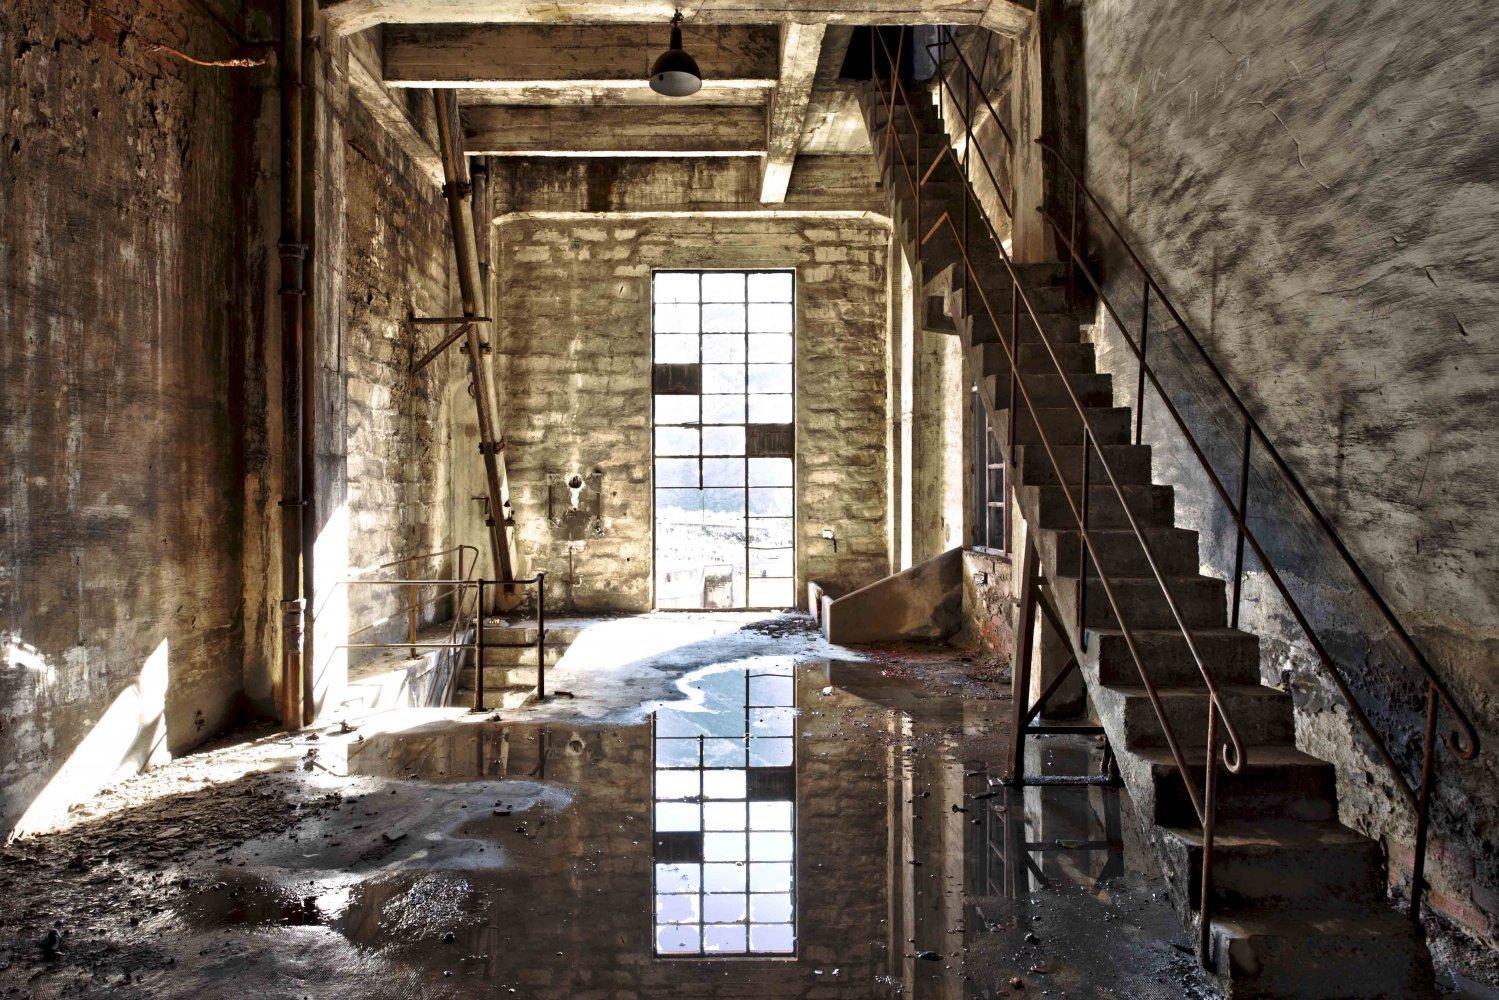 stair to heaven - POWER STATION - cesar azcarate fotografia, galerias, power station